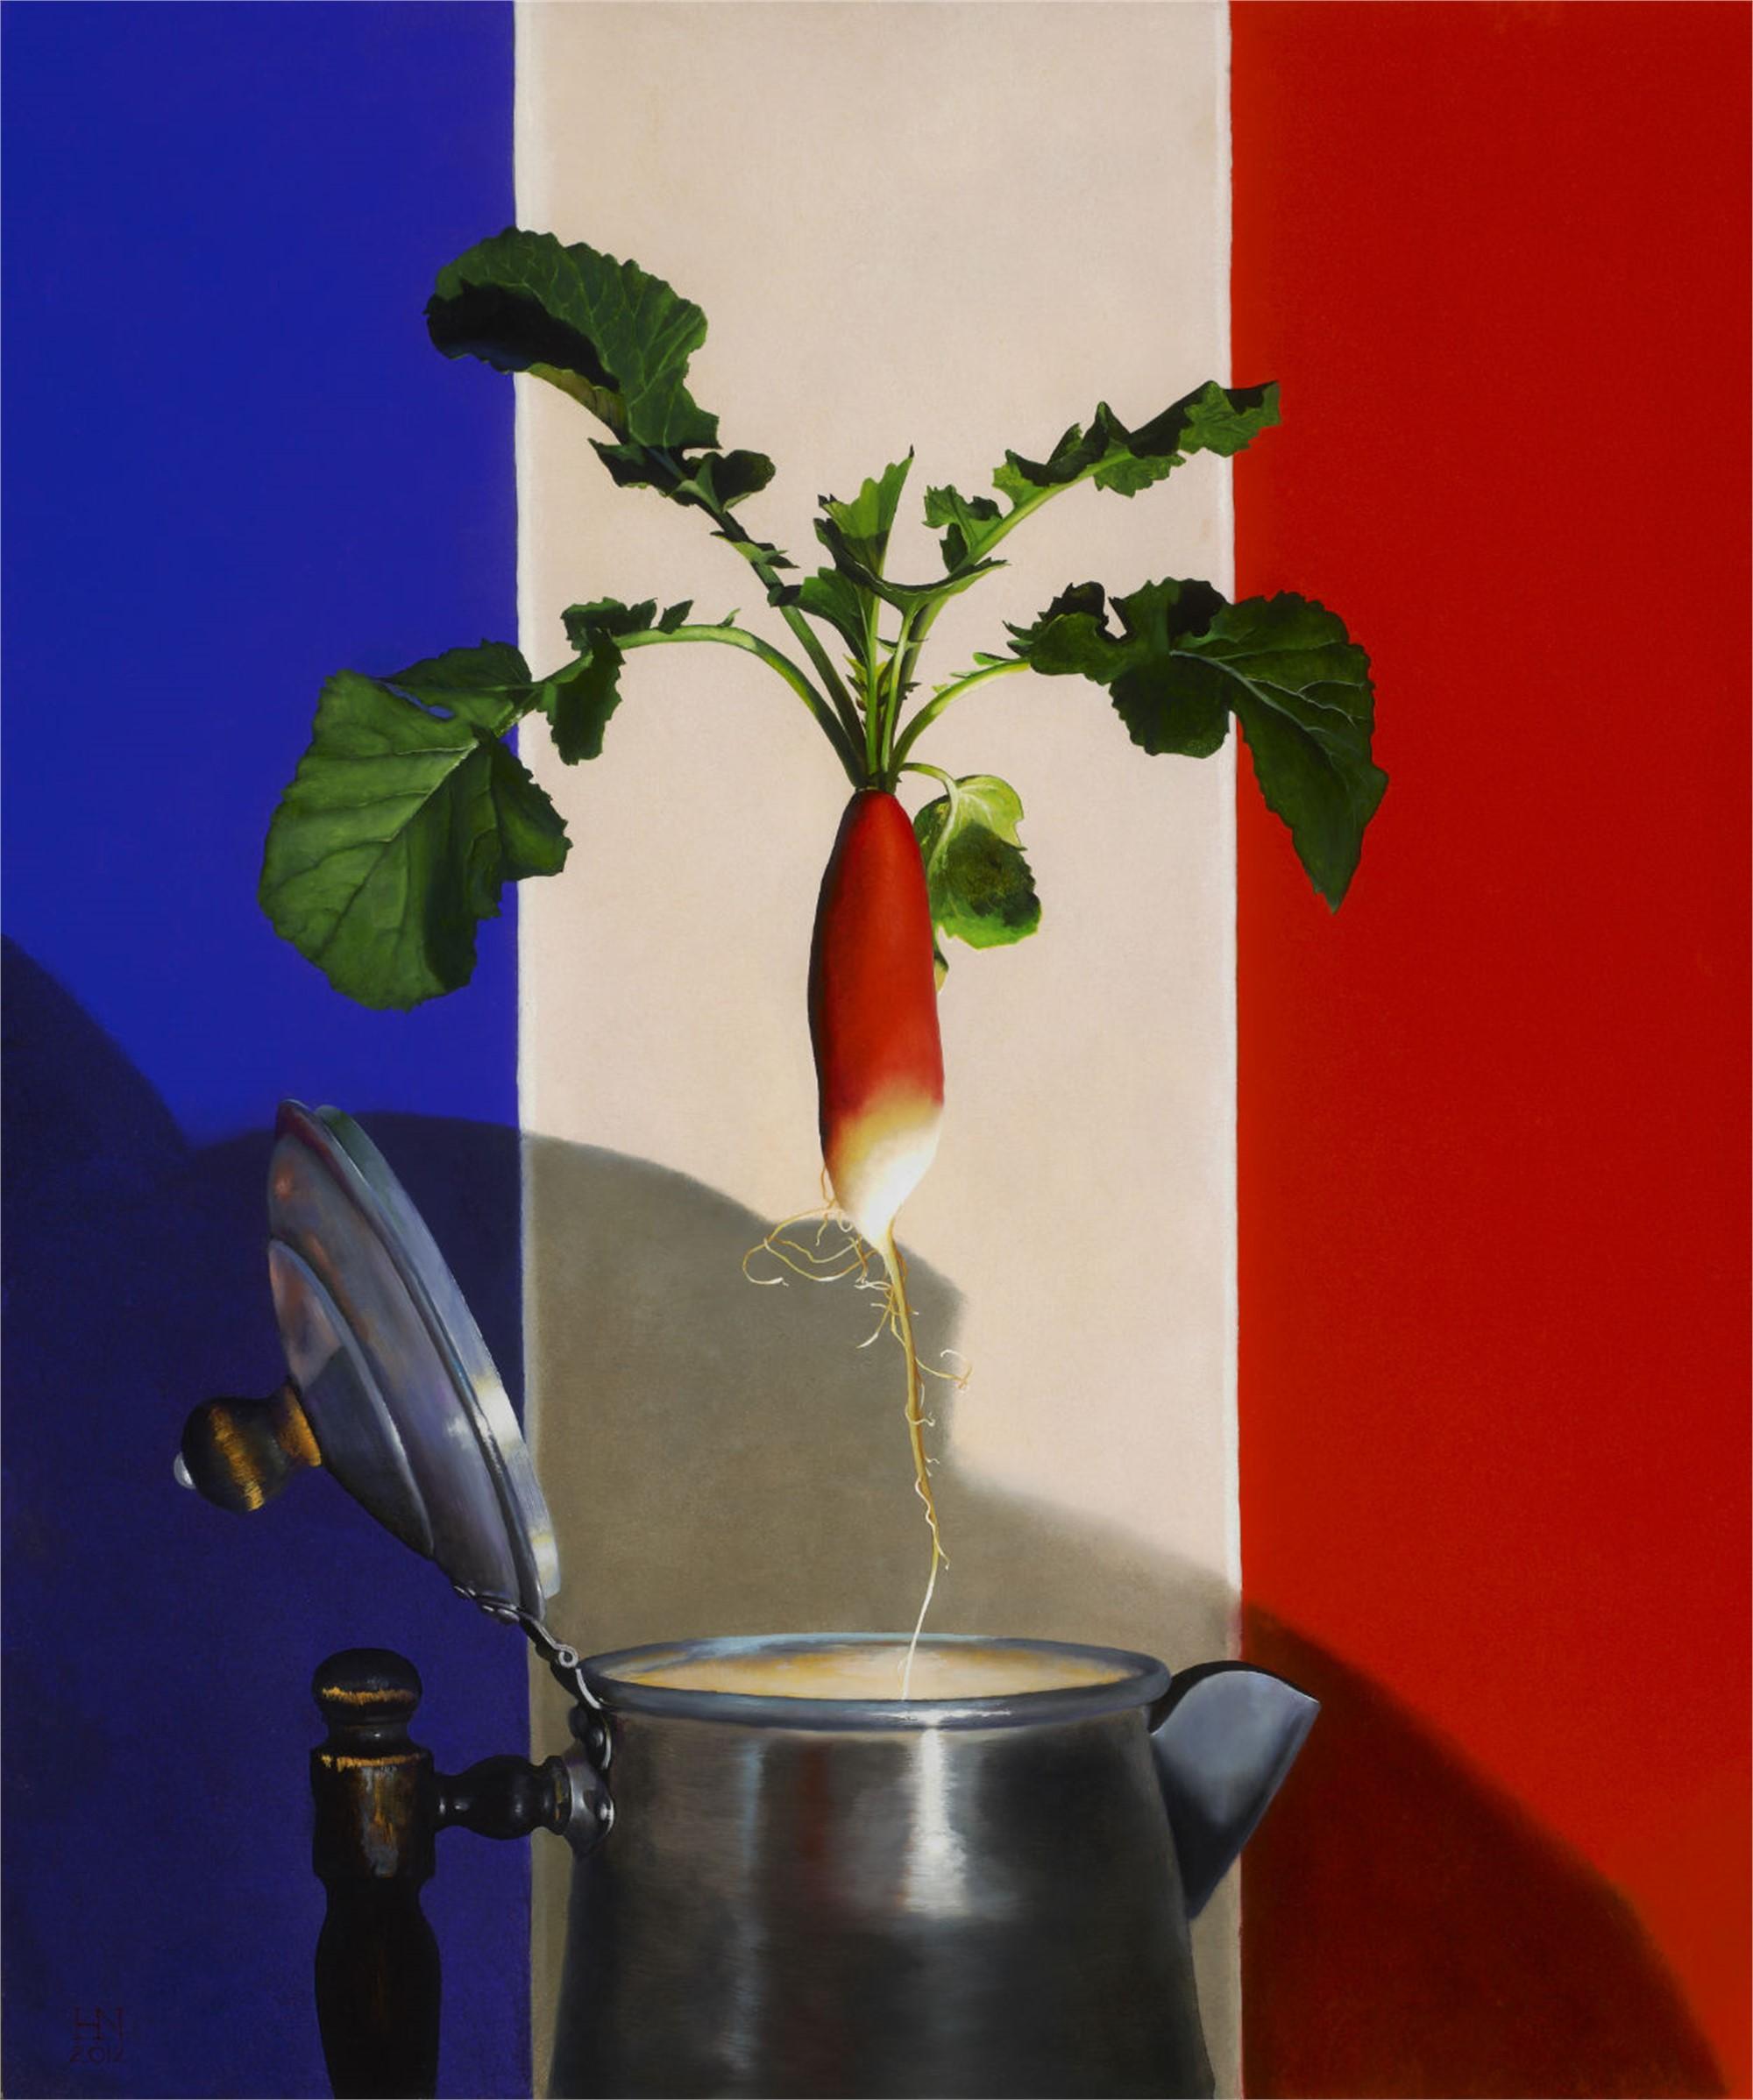 French Breakfast Radish by Heather Neill